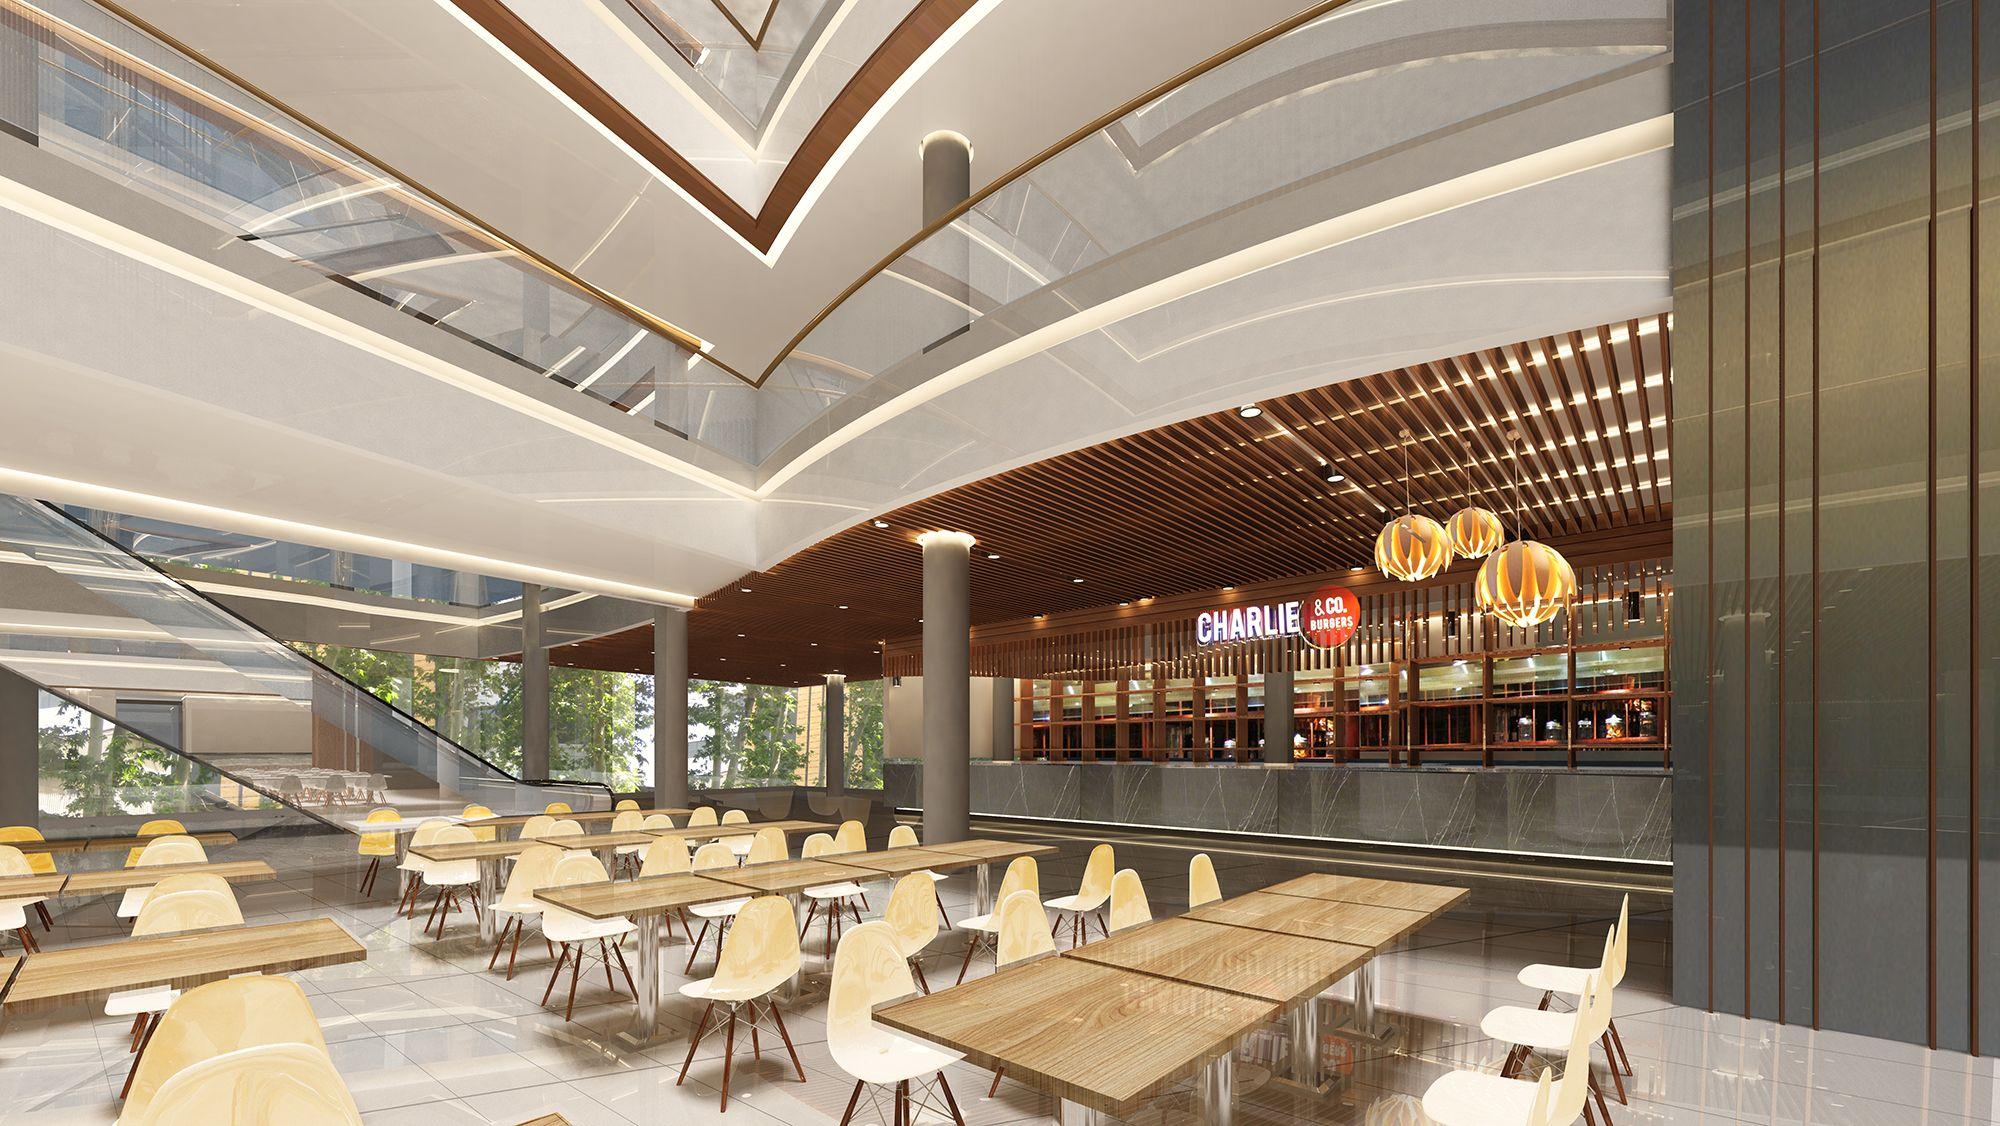 Interior Design architecture Pinterest Shopping mall